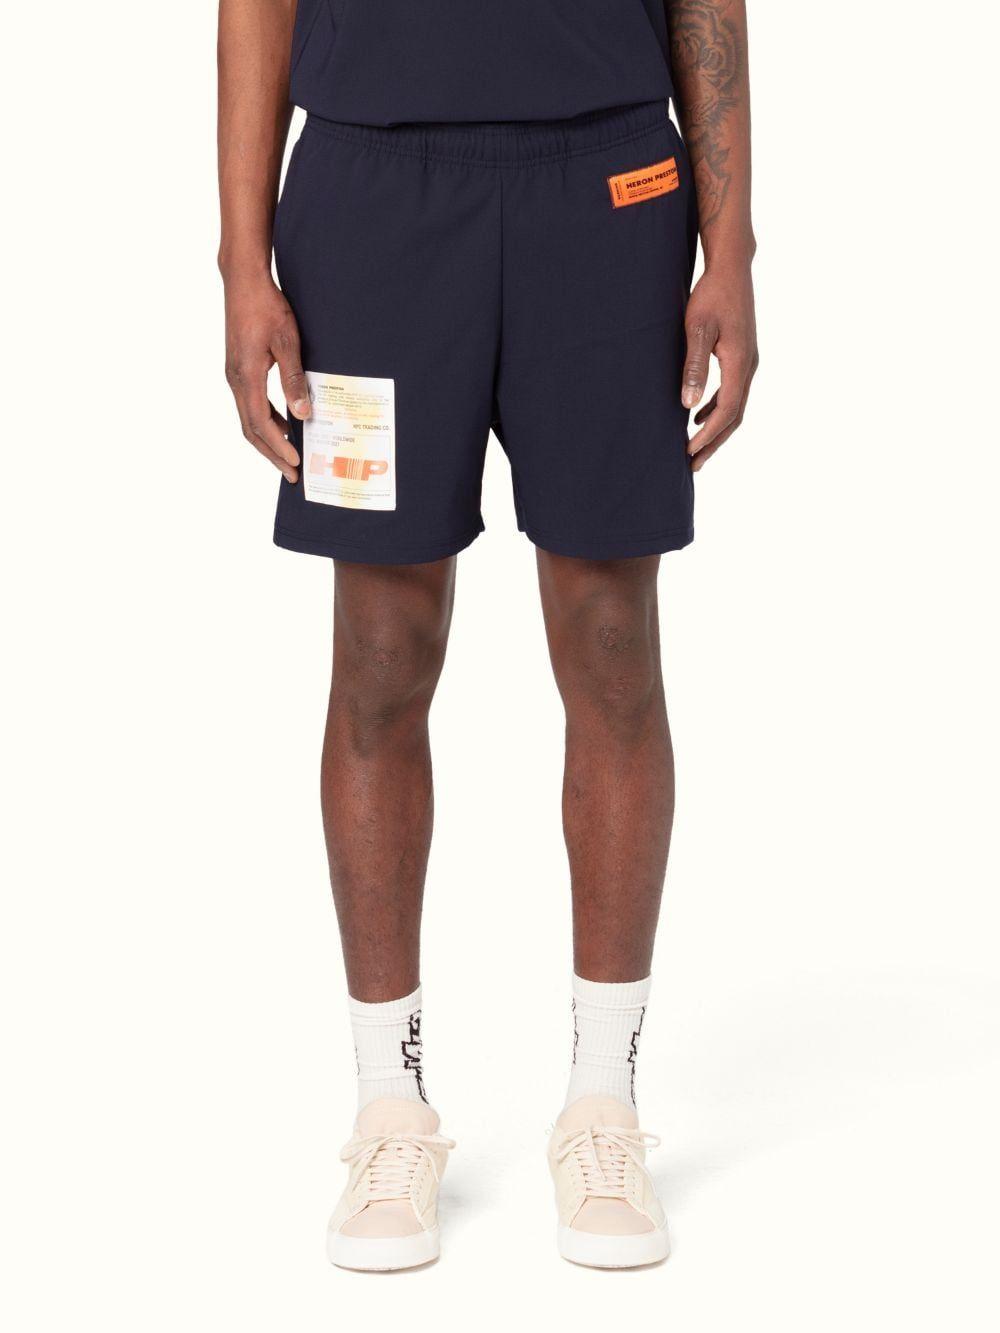 Shorts active - Heron Preston